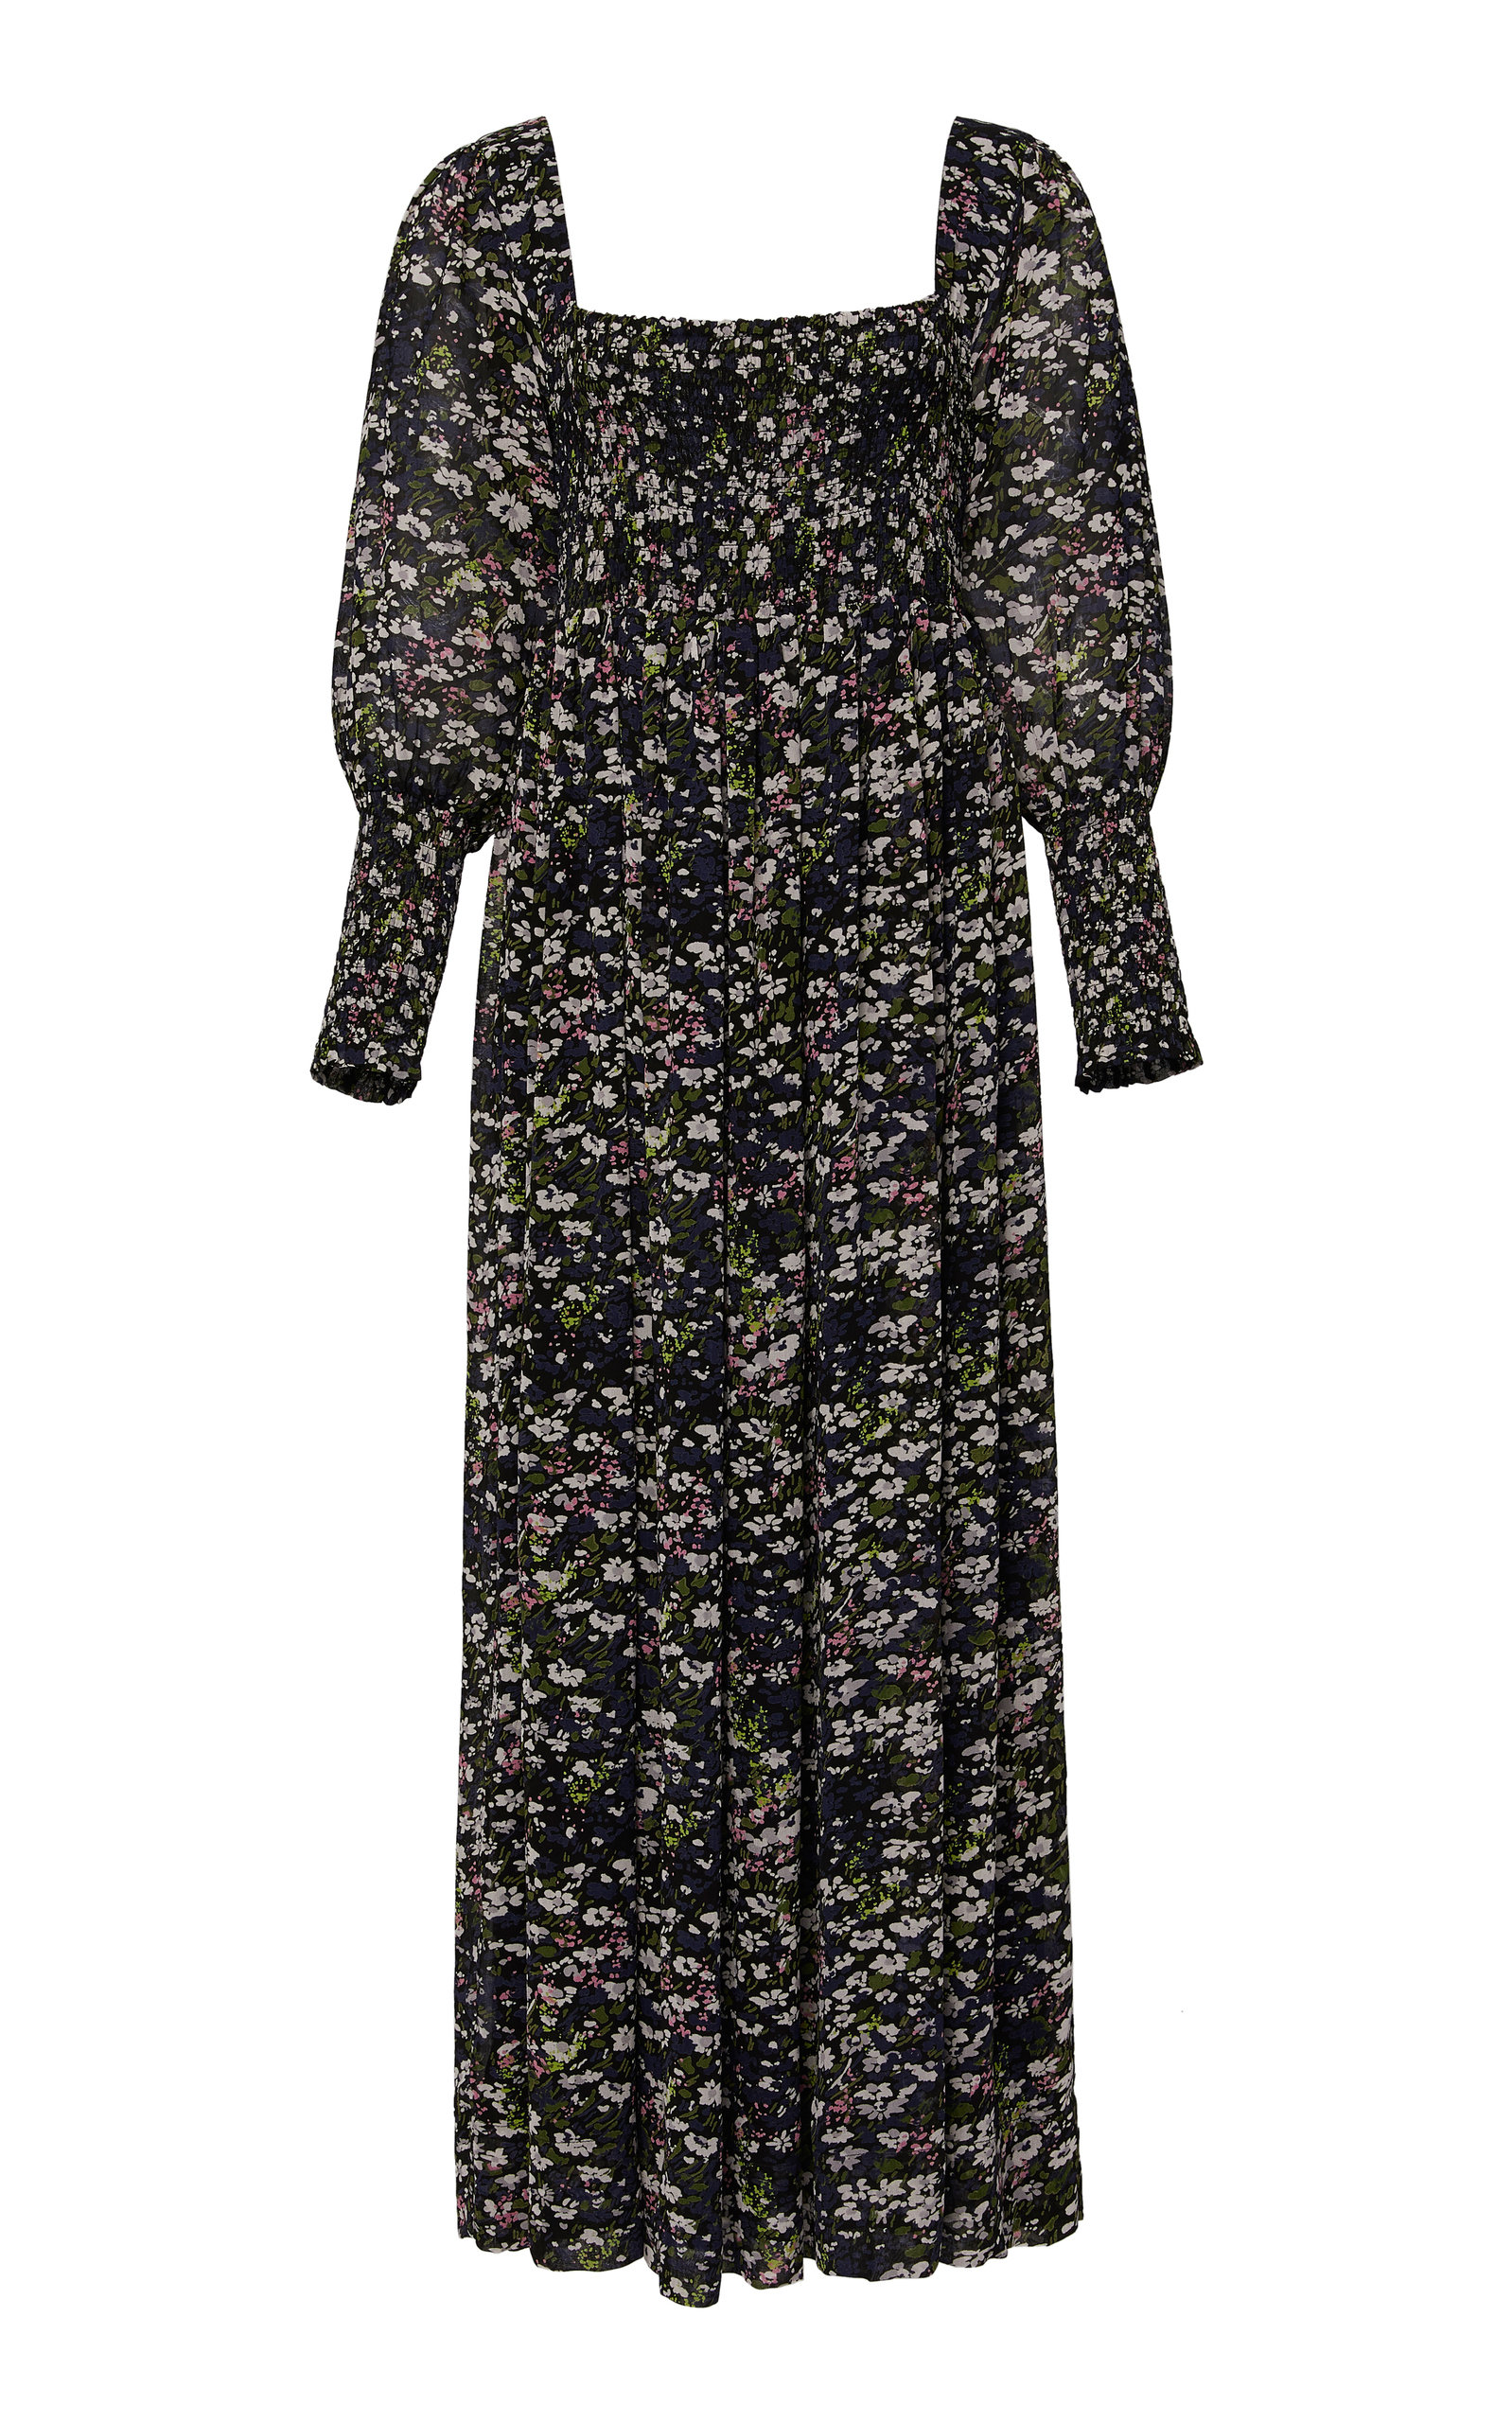 63c9f77757 Floral-Print Georgette Maxi Dress by Ganni | Moda Operandi